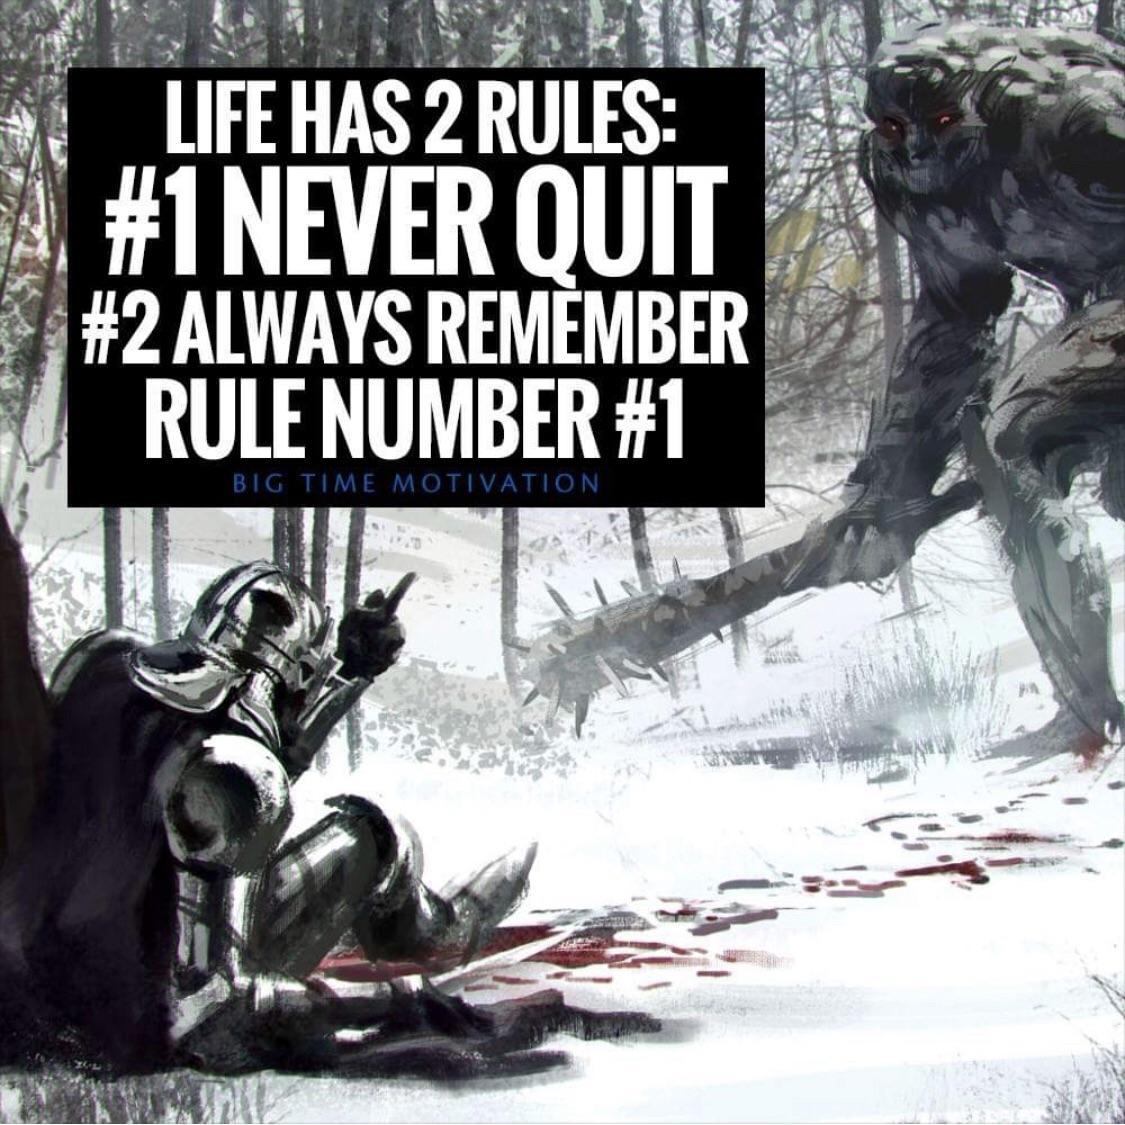 [Image] Life has 2 rules: [OC]